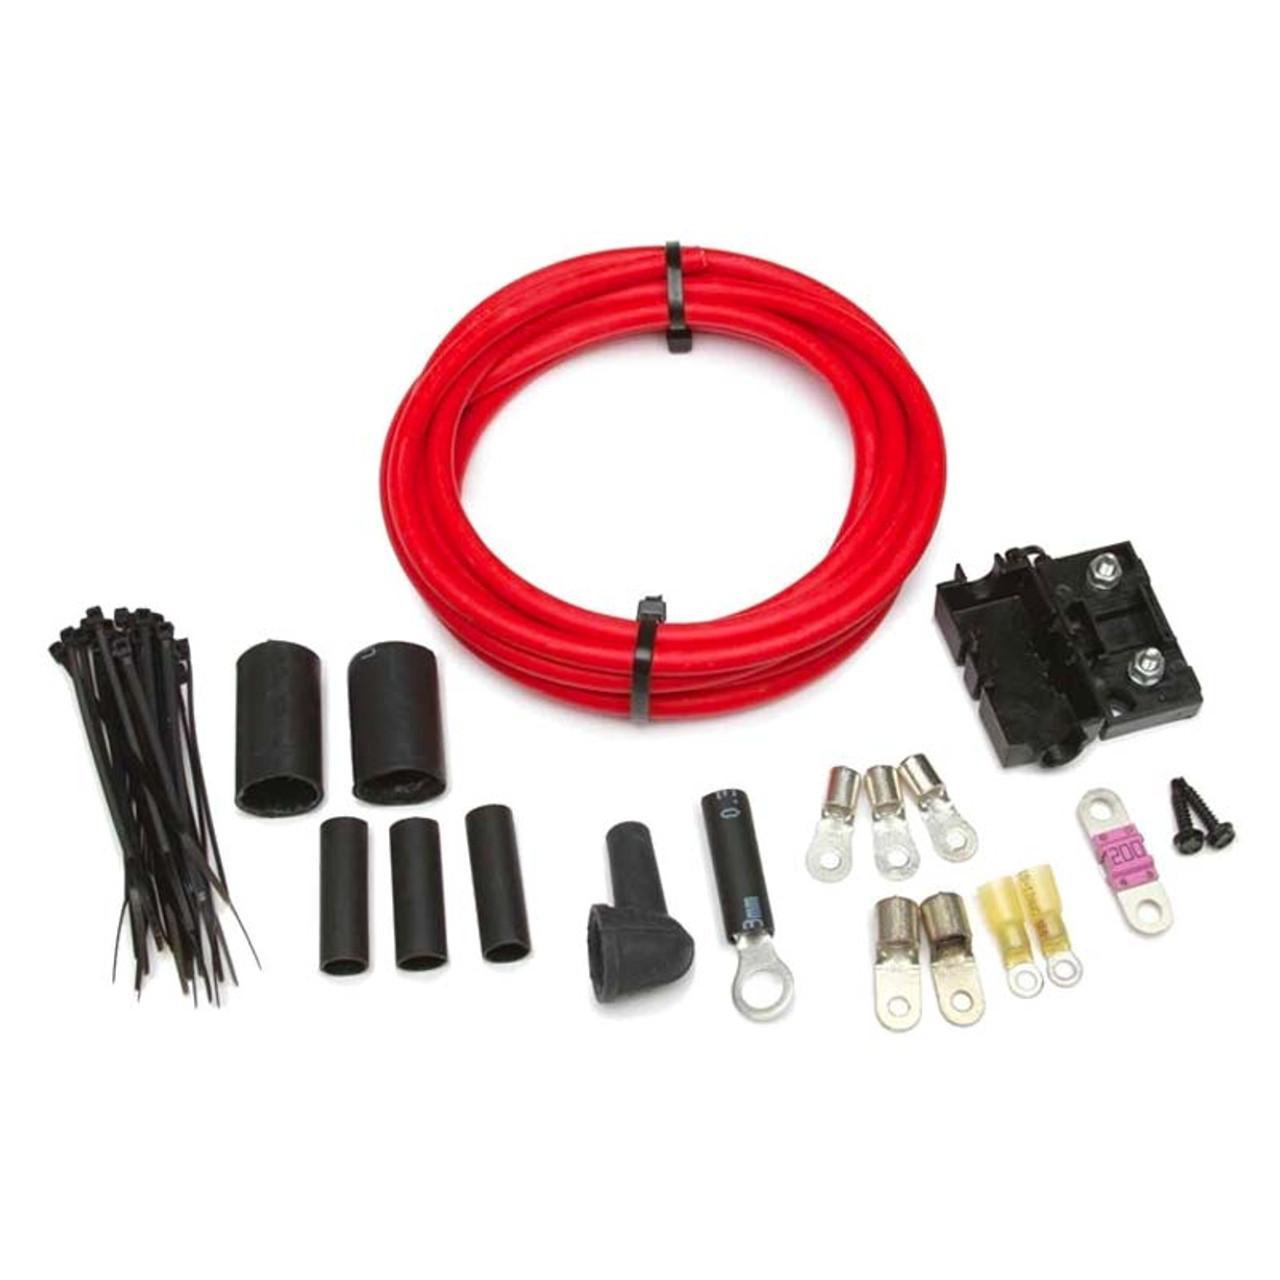 high amp 1 wire alternator wiring kit from painless performance rh cvfracing com high amp alternator wiring 300 Amp Alternator